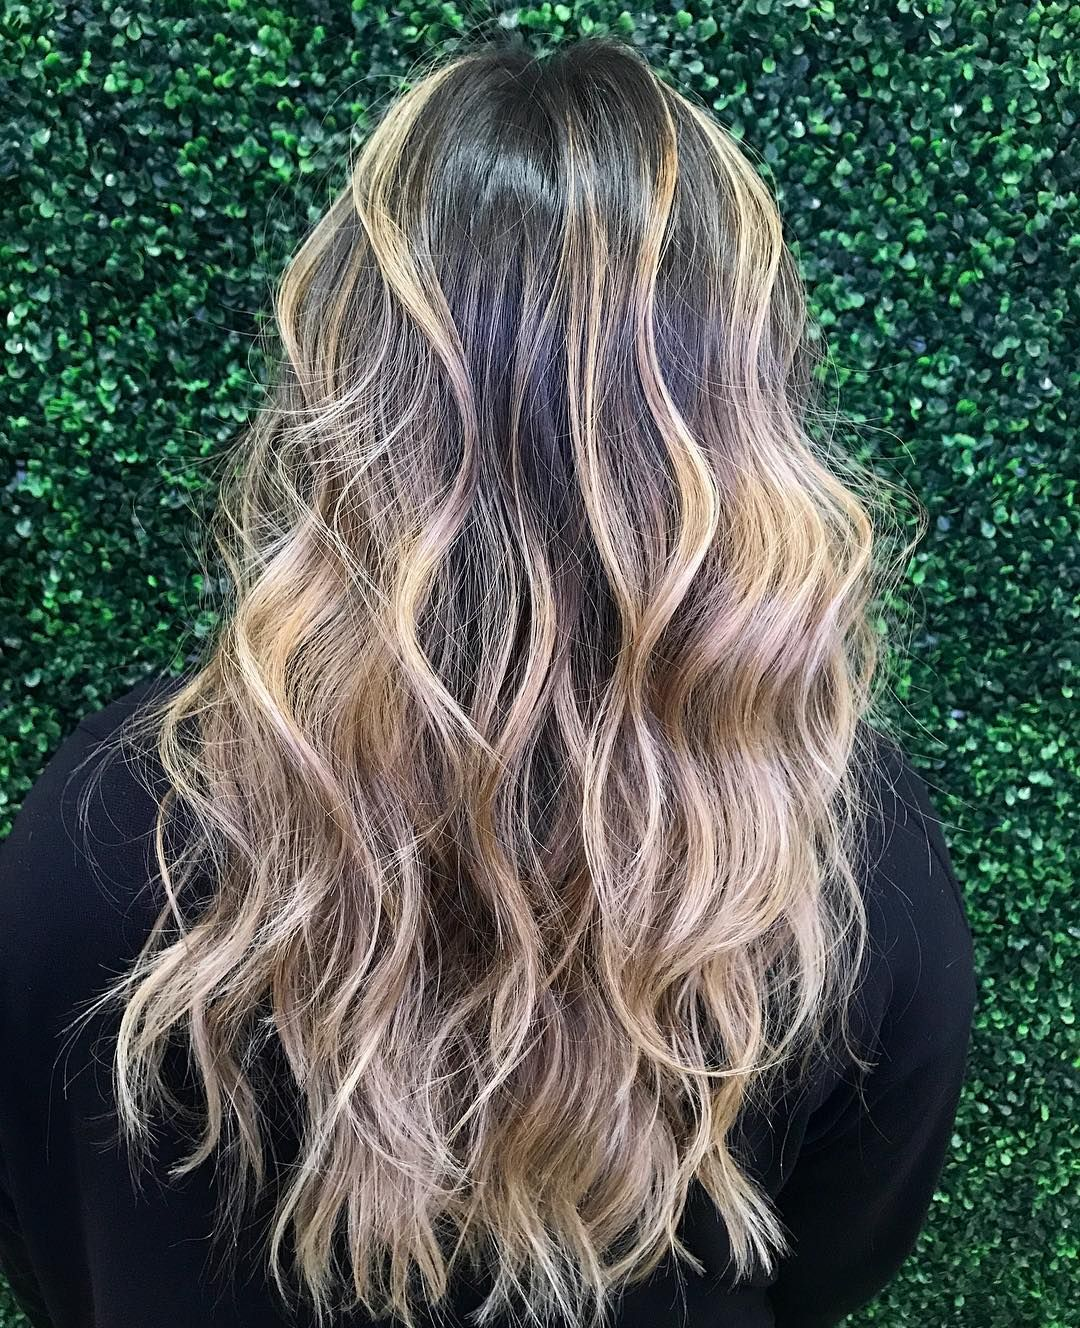 Pin By Studio Rk Salon Hair Salon On Hair In 2020 Best Hair Salon Hair Styles Hair Salon